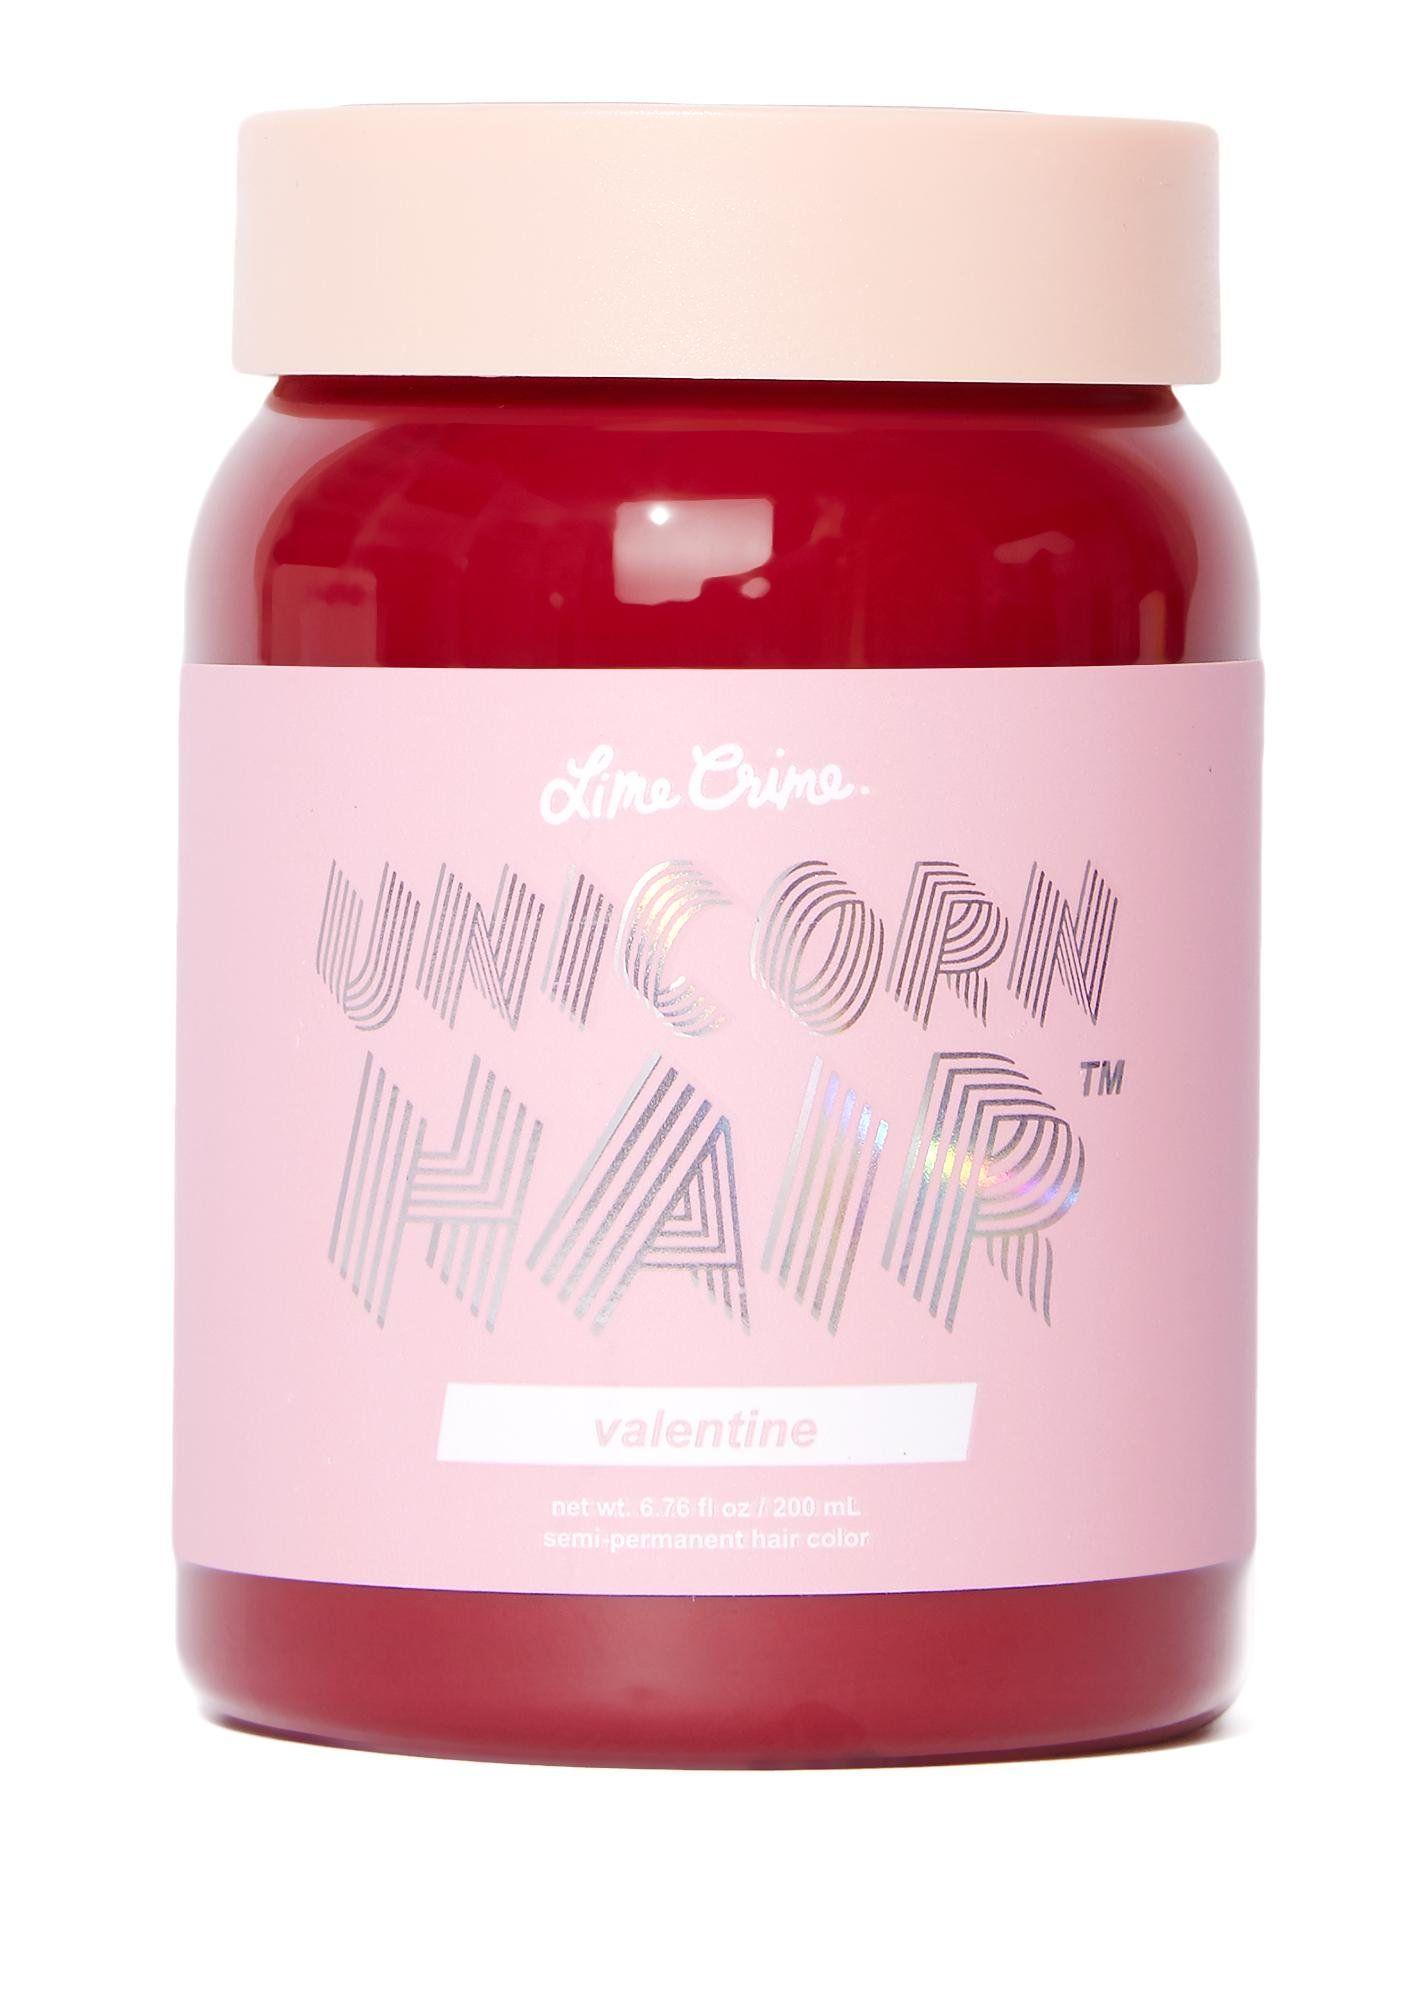 Lime Crime Valentine Unicorn Hair Dye | Dolls Kill in 2020 | Unicorn hair dye, Unicorn hair ...